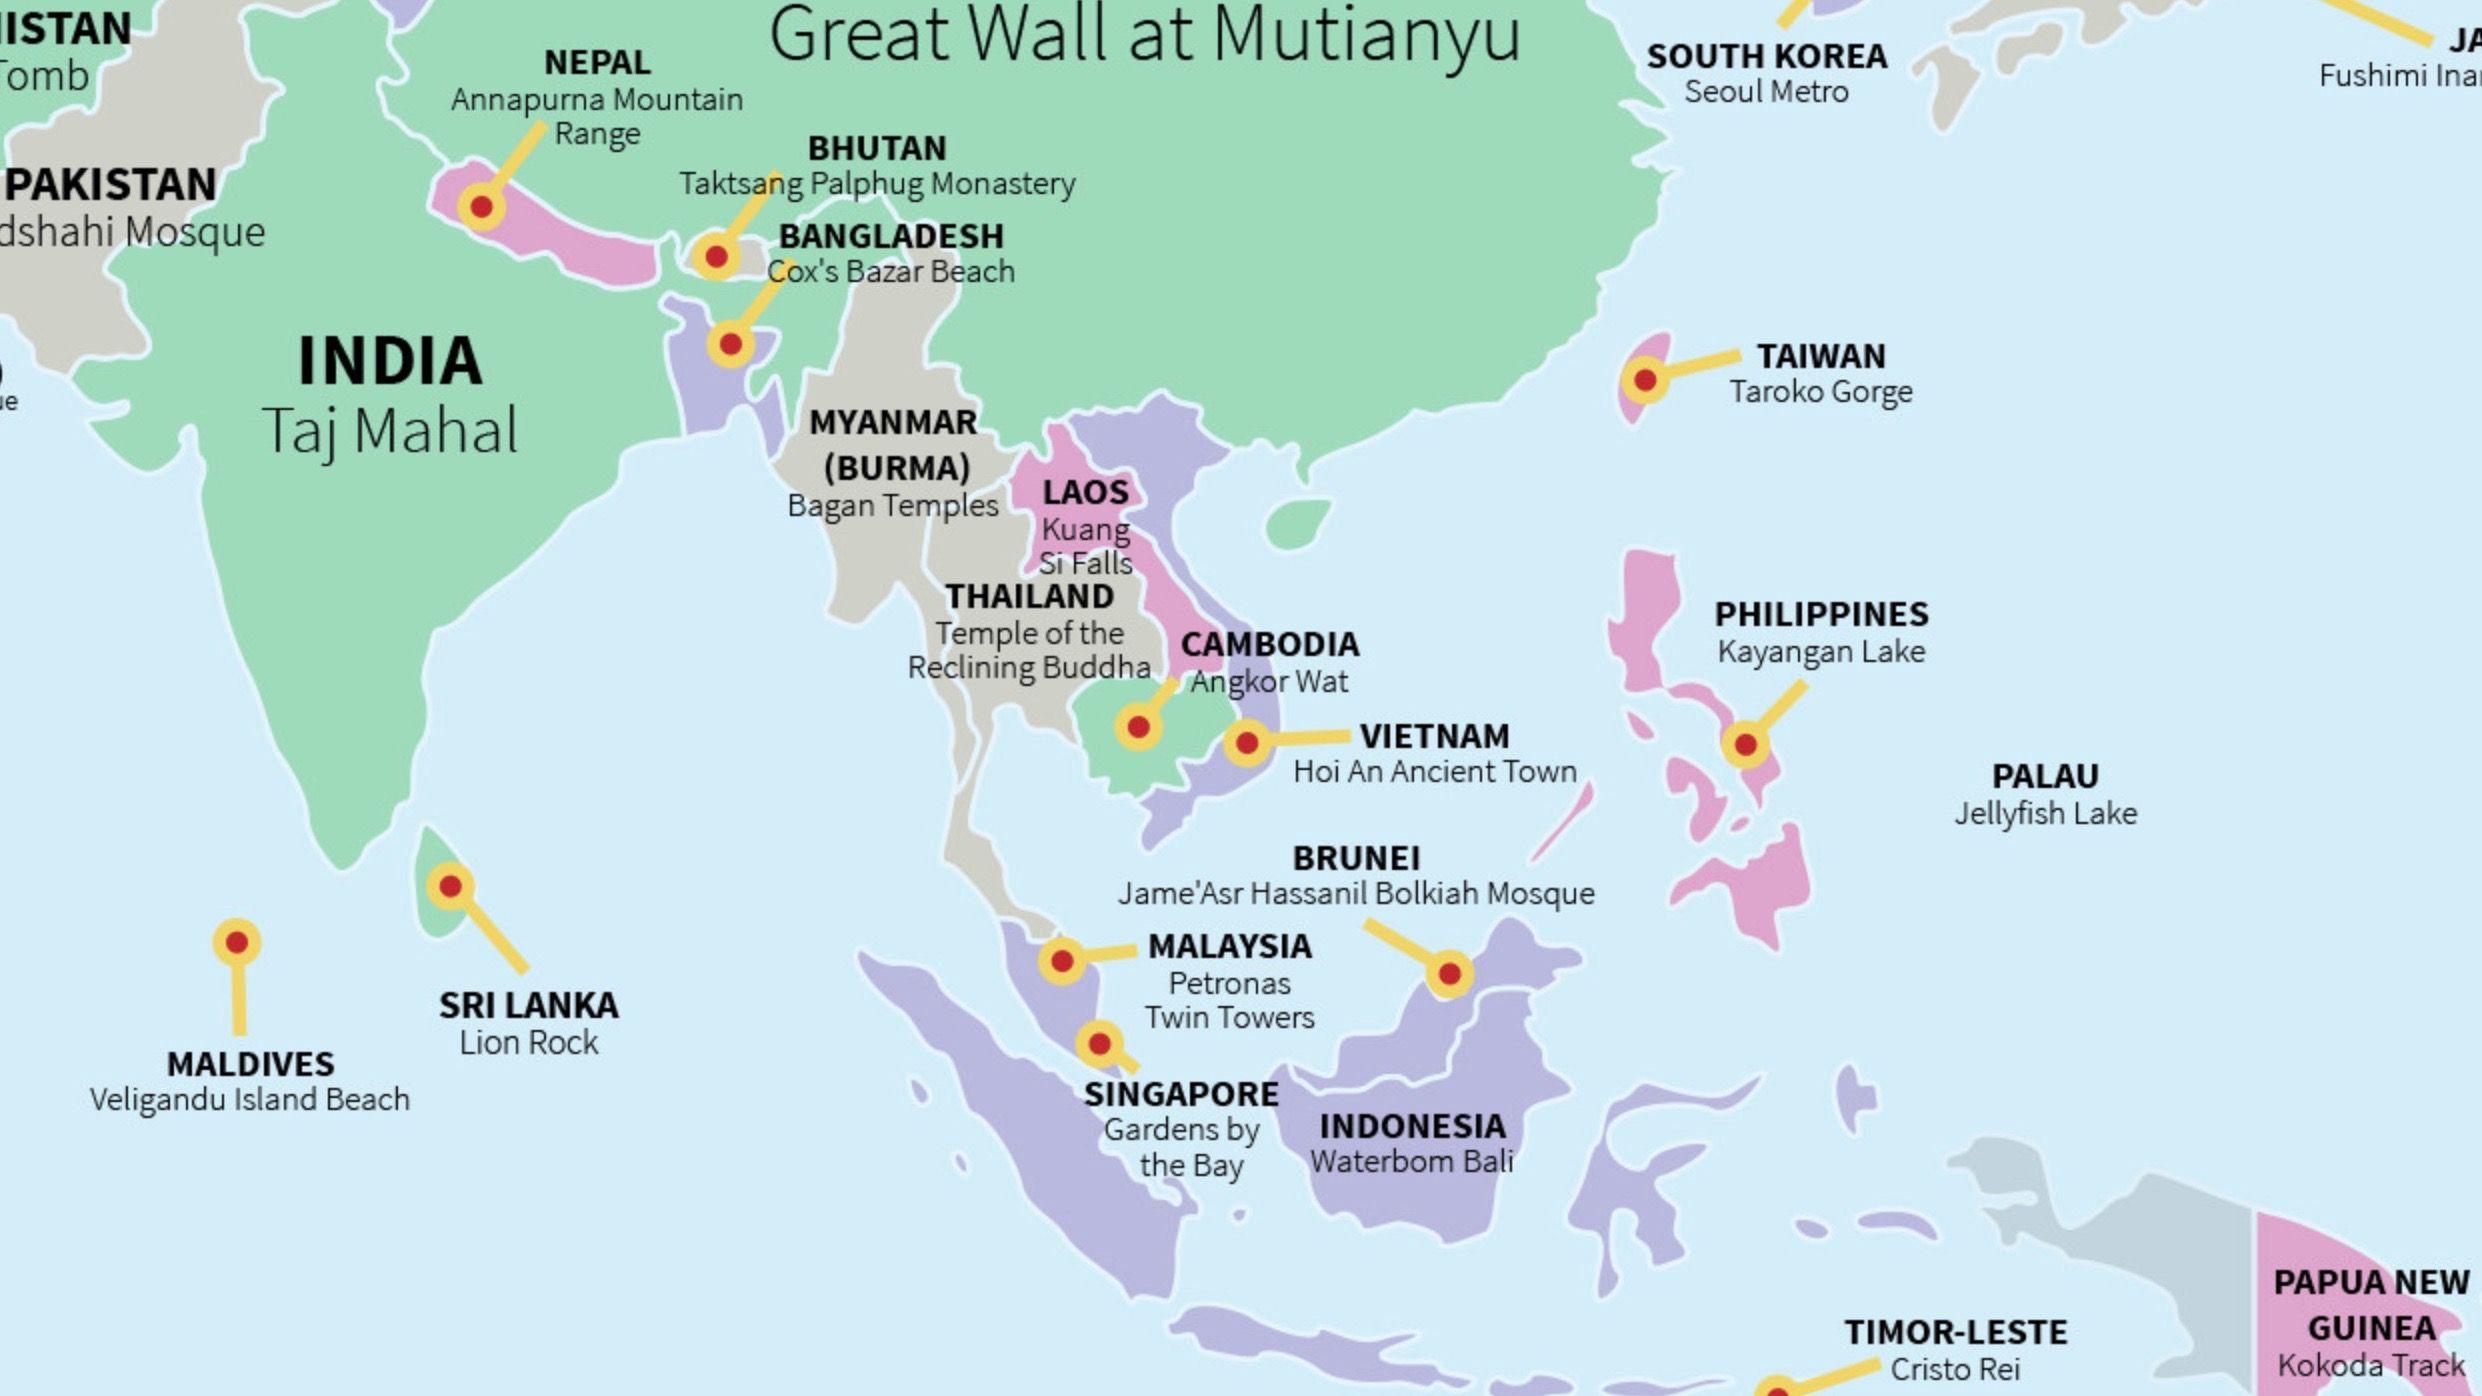 3 Southeast Asia:Oceana Travel Hotspots